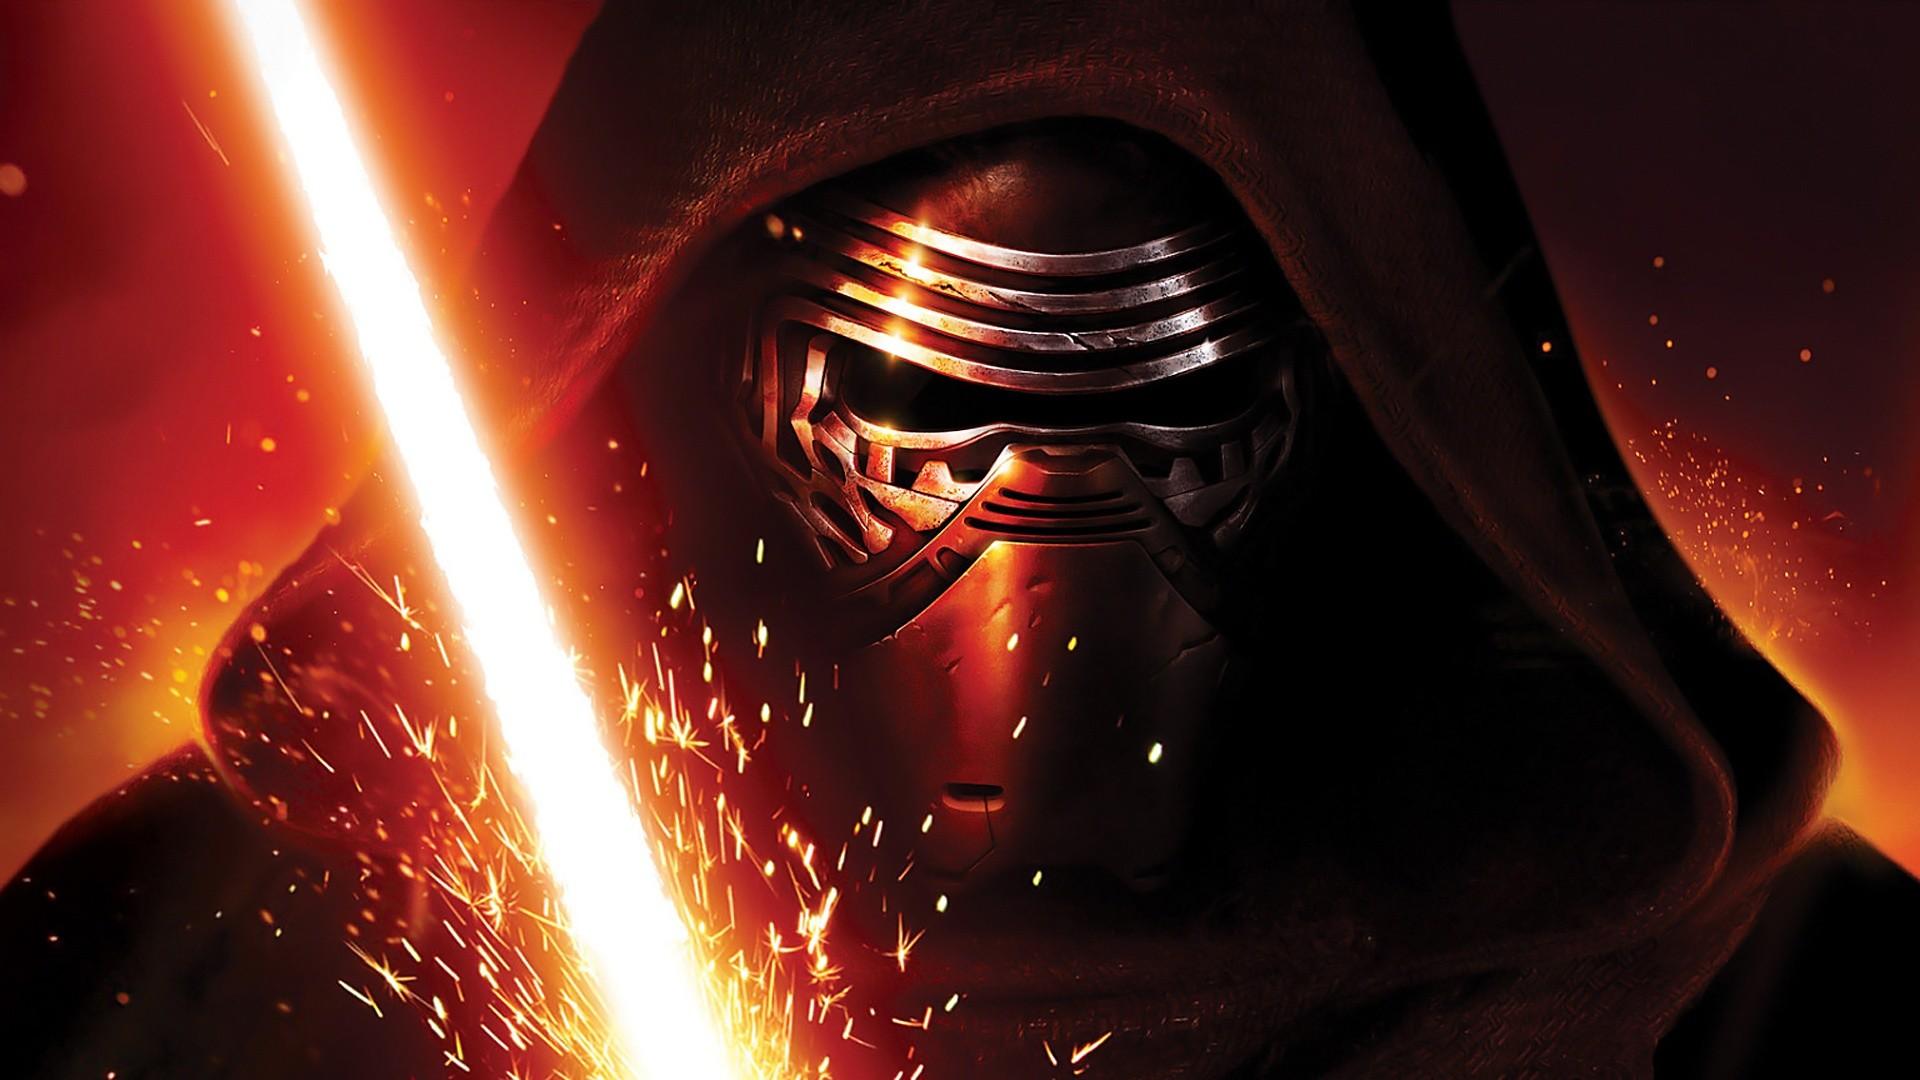 Image – Kylo ren-wallpaper-star wars 7 the force awakens-1920×1200.jpg |  Powerhouse Of Entertainment Wikia | FANDOM powered by Wikia